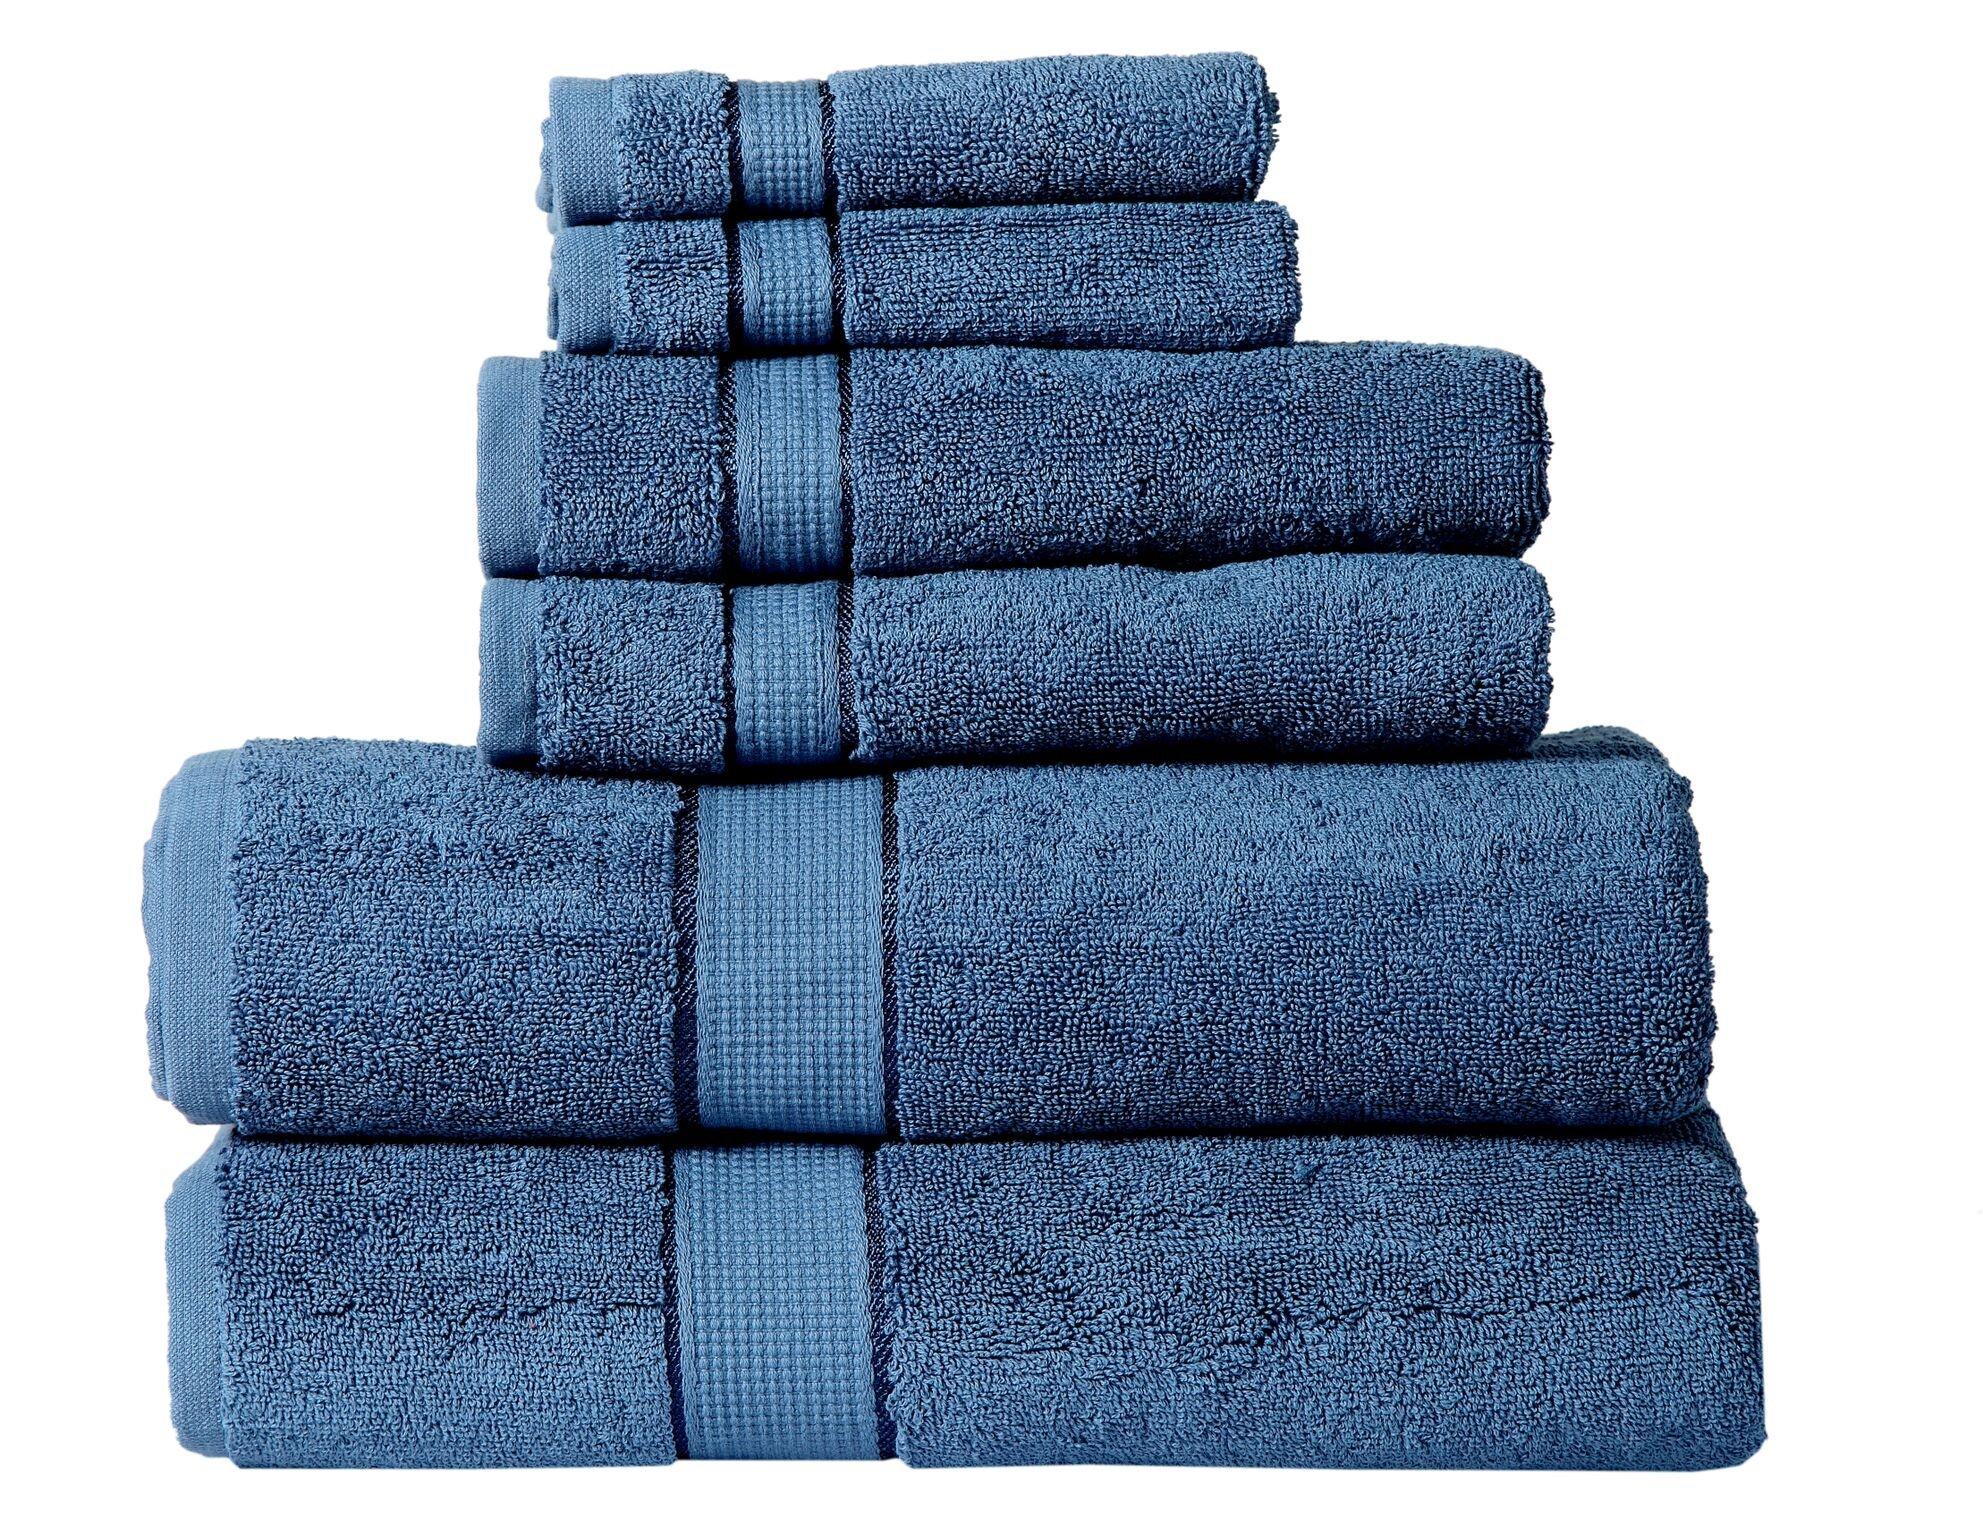 Panache Collection 600 GSM Ultra Soft 100% Cotton 6 Piece Towel Set (Navy Blue): 2 Bath Towels, 2 Hand Towels, 2 Washcloths, Long-Staple Cotton, Spa Hotel Quality, Super Absorbent, Machine Washable